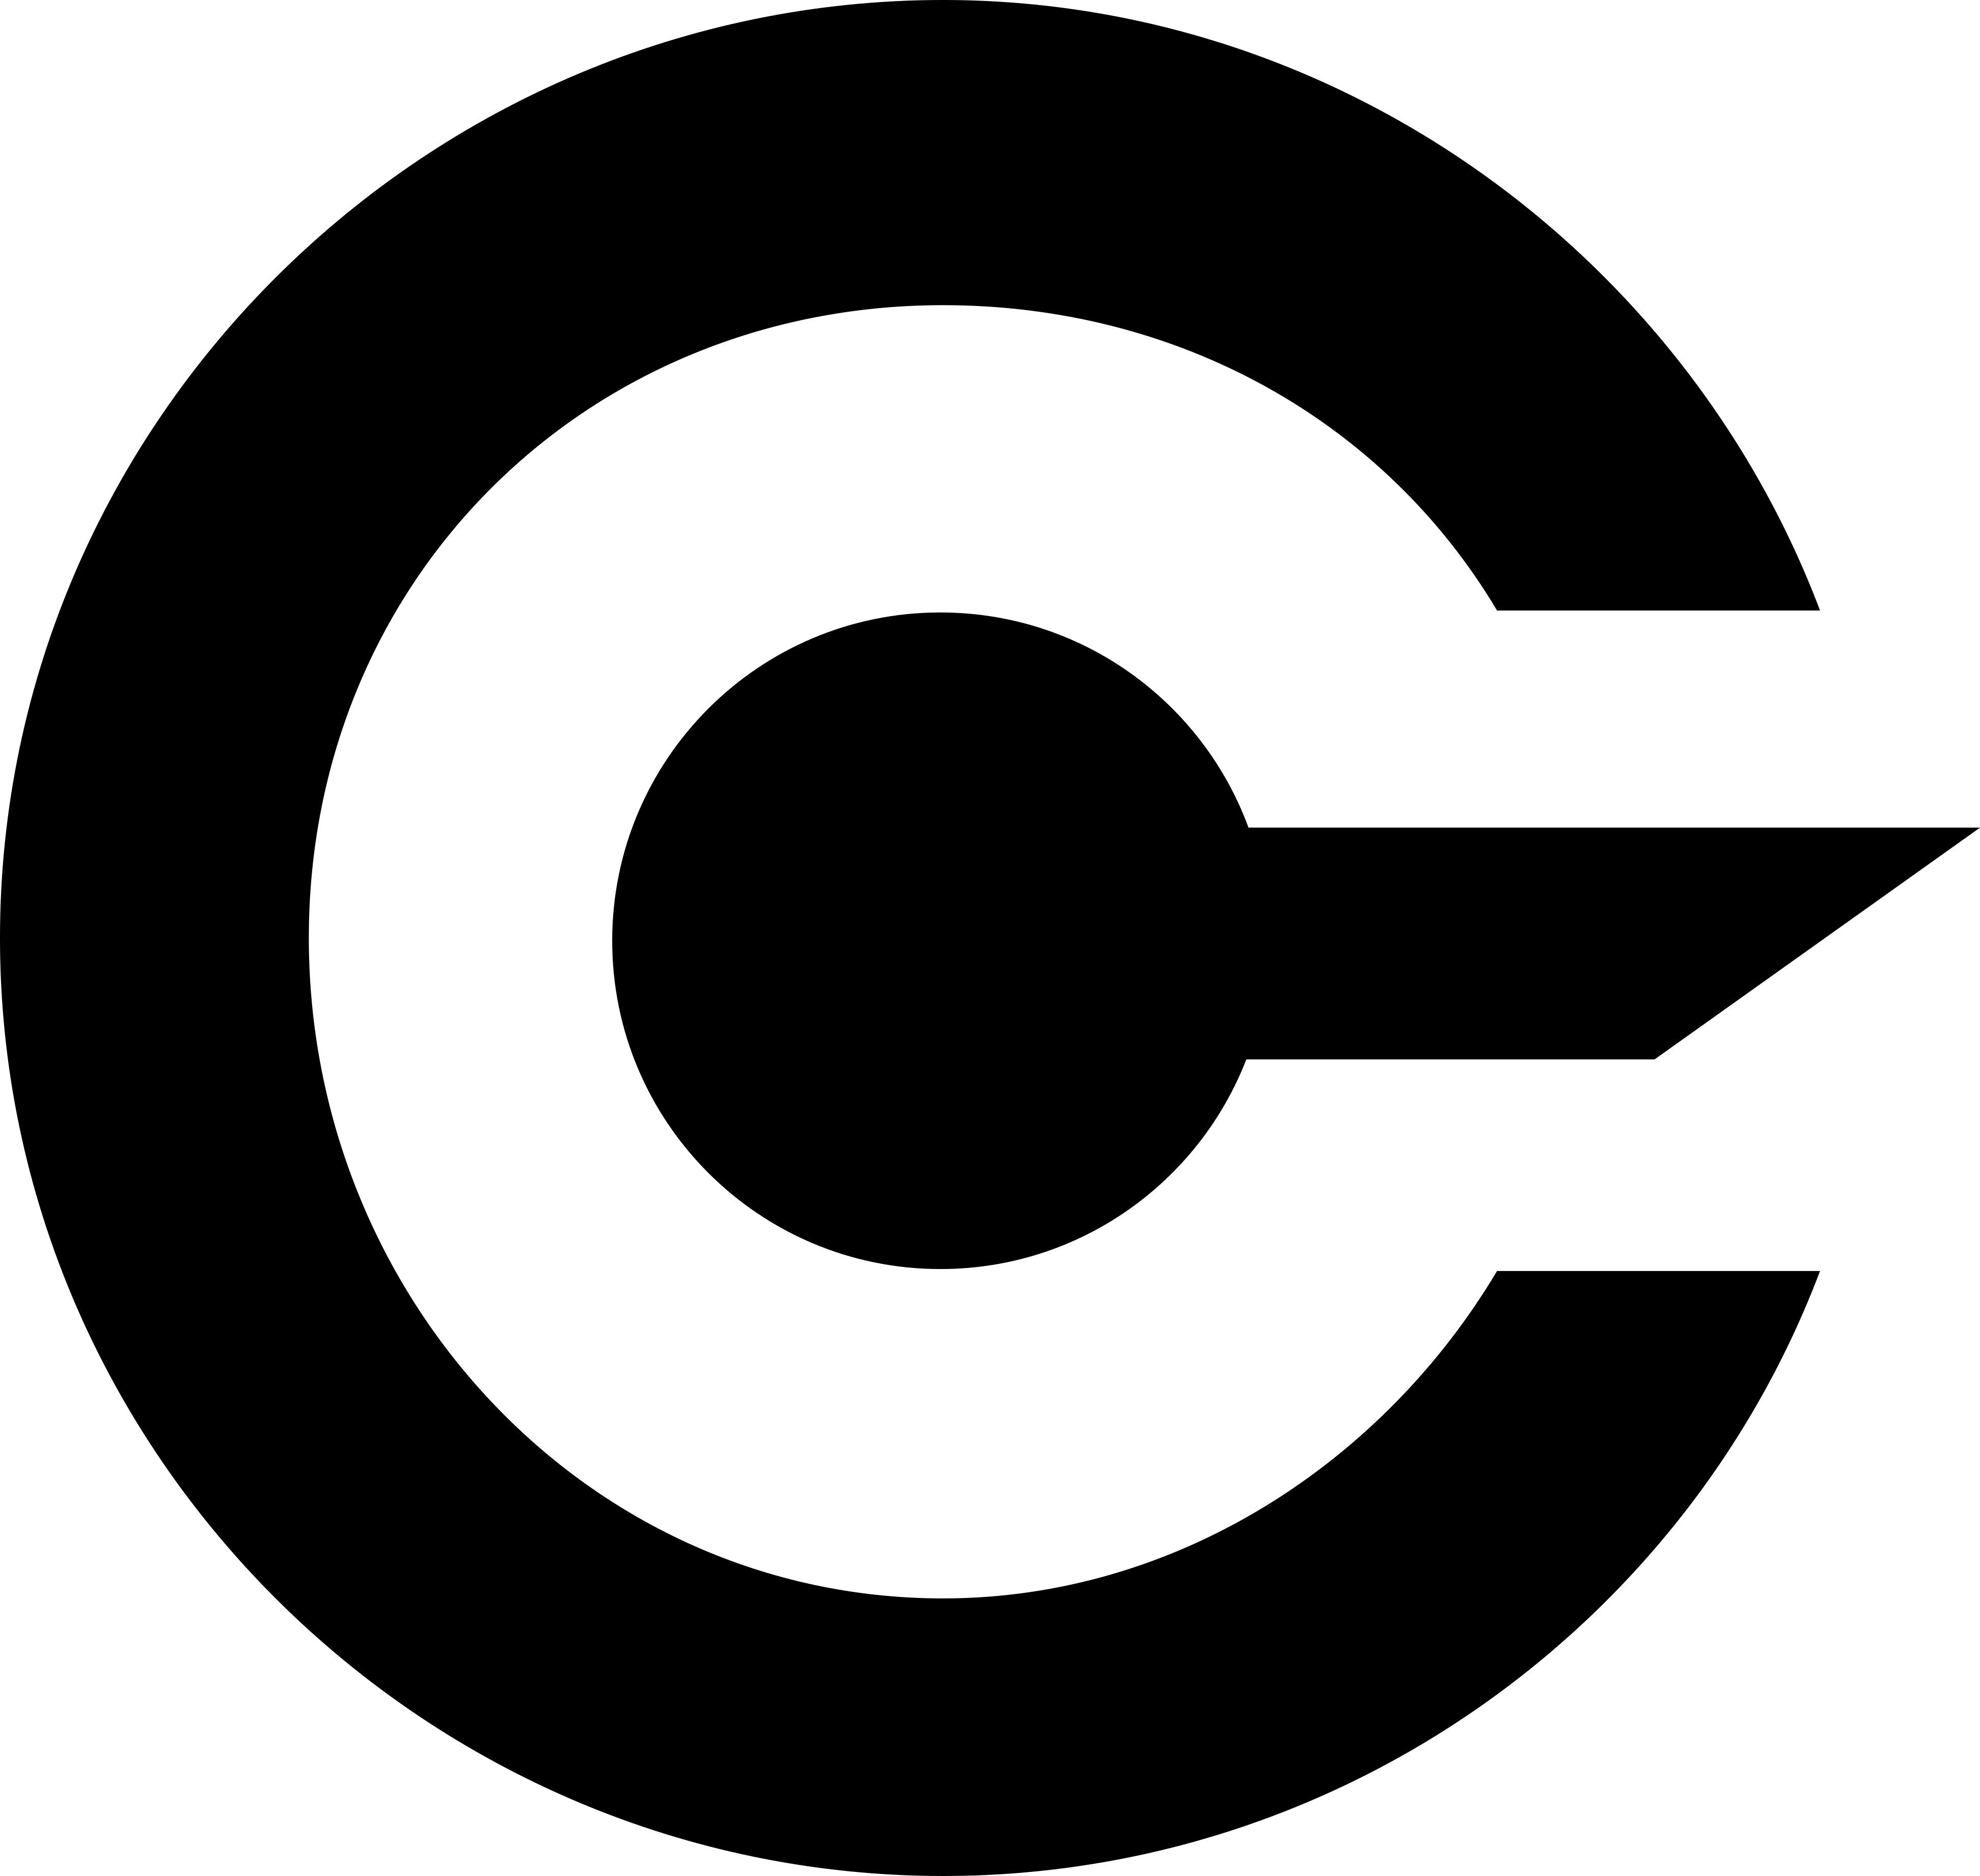 Black Bitcoin Logo Png